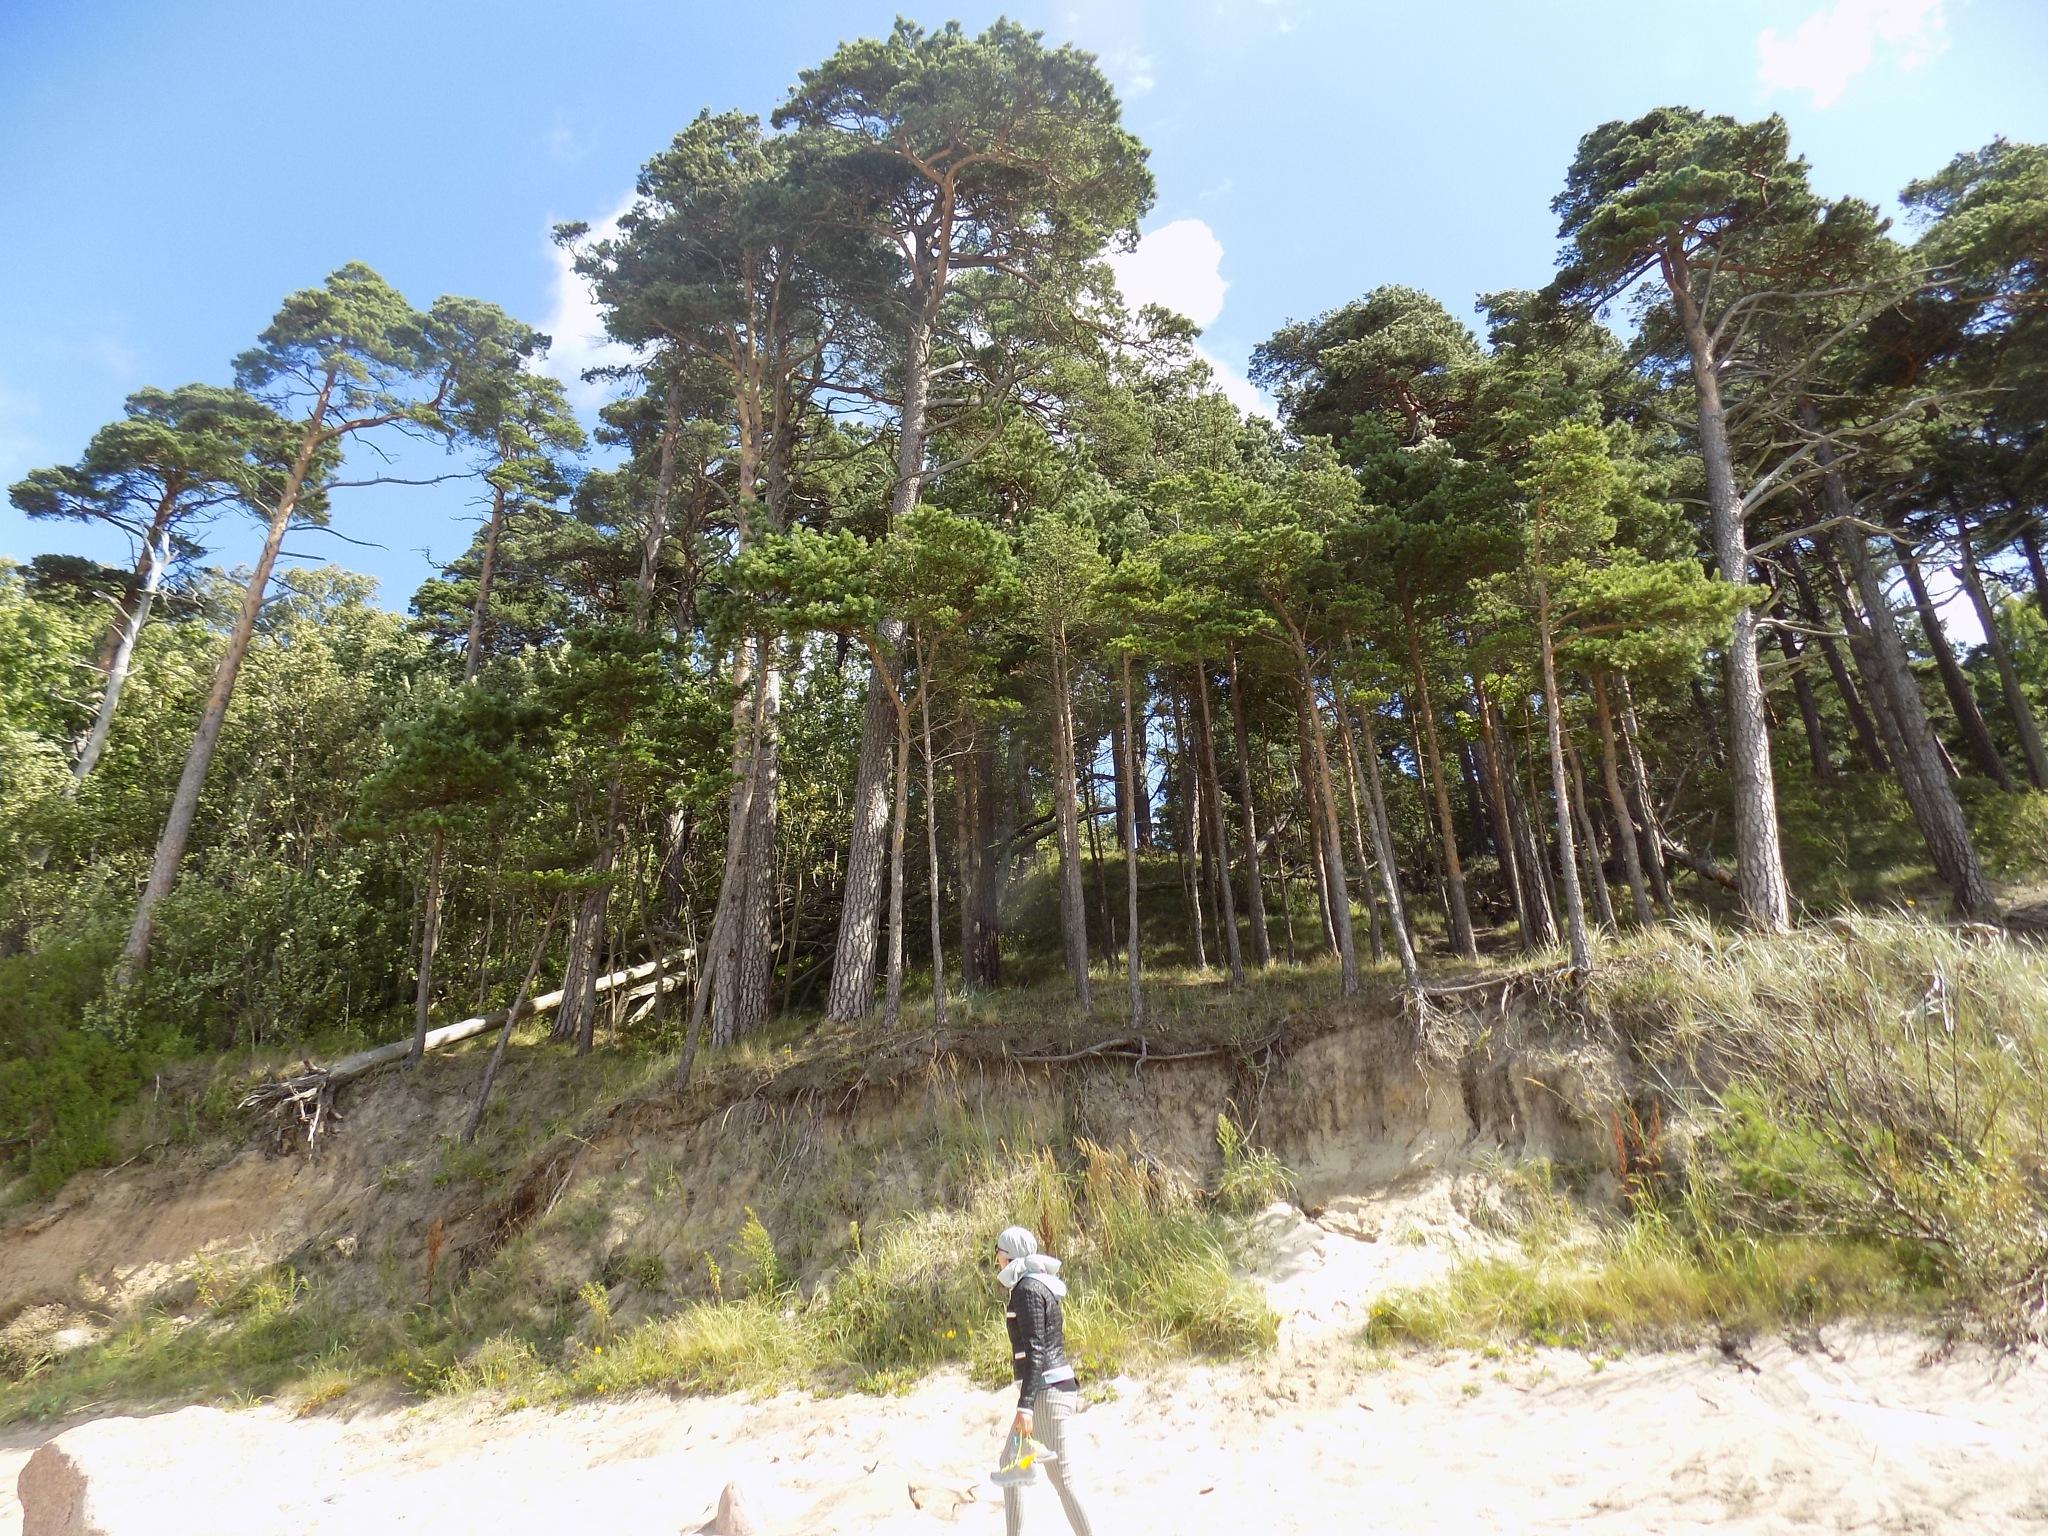 Seaside Forest by uzkuraitiene62